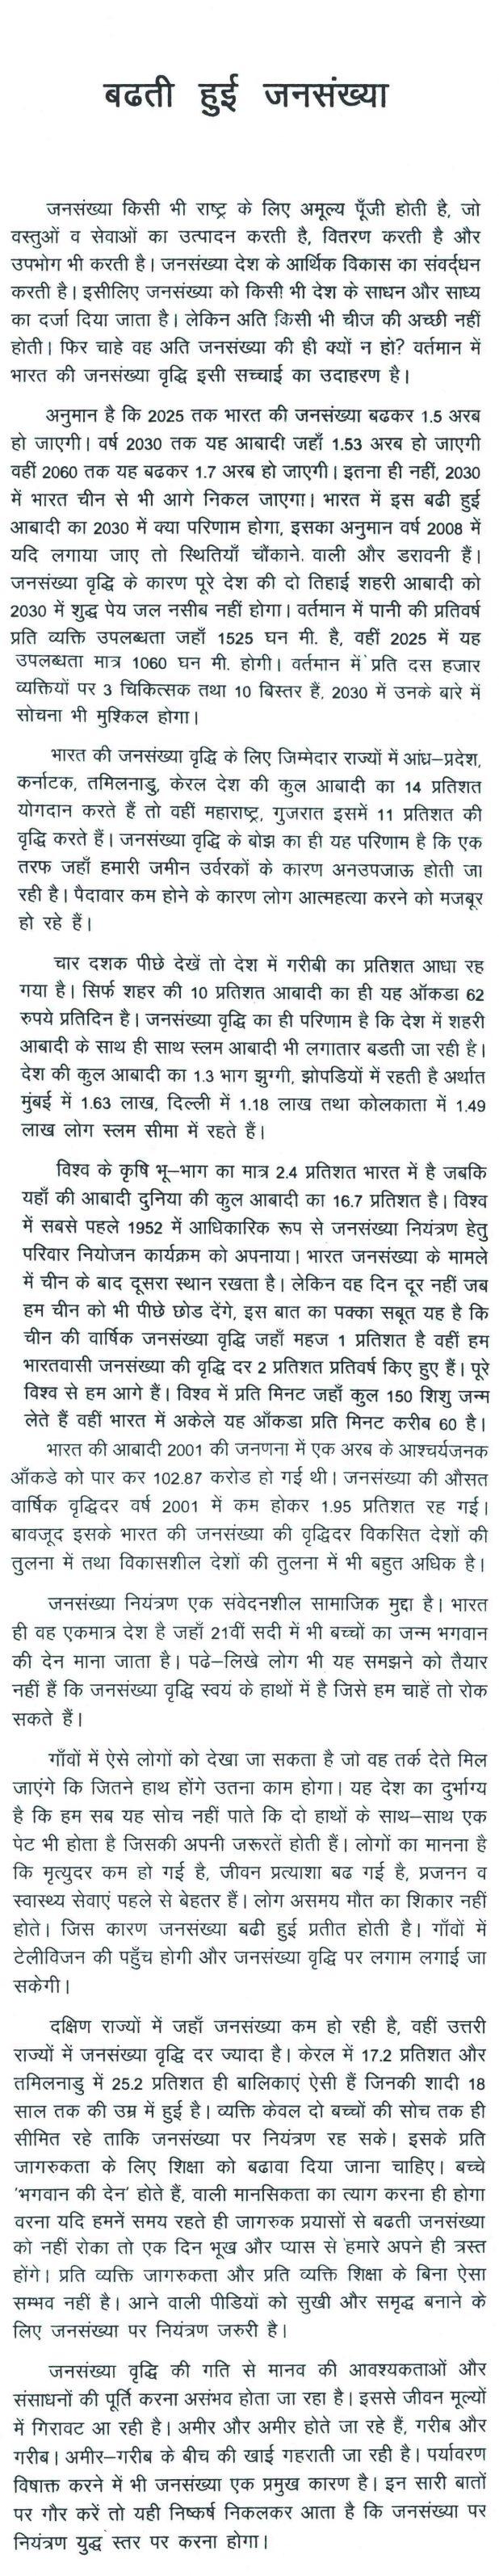 014 Essay Population Thumb On Growing In India Explosion Pdf Growth Problem Overpopulation Pollution Hindi Control Increasing 618x3189 Impressive Kannada Pakistan Full